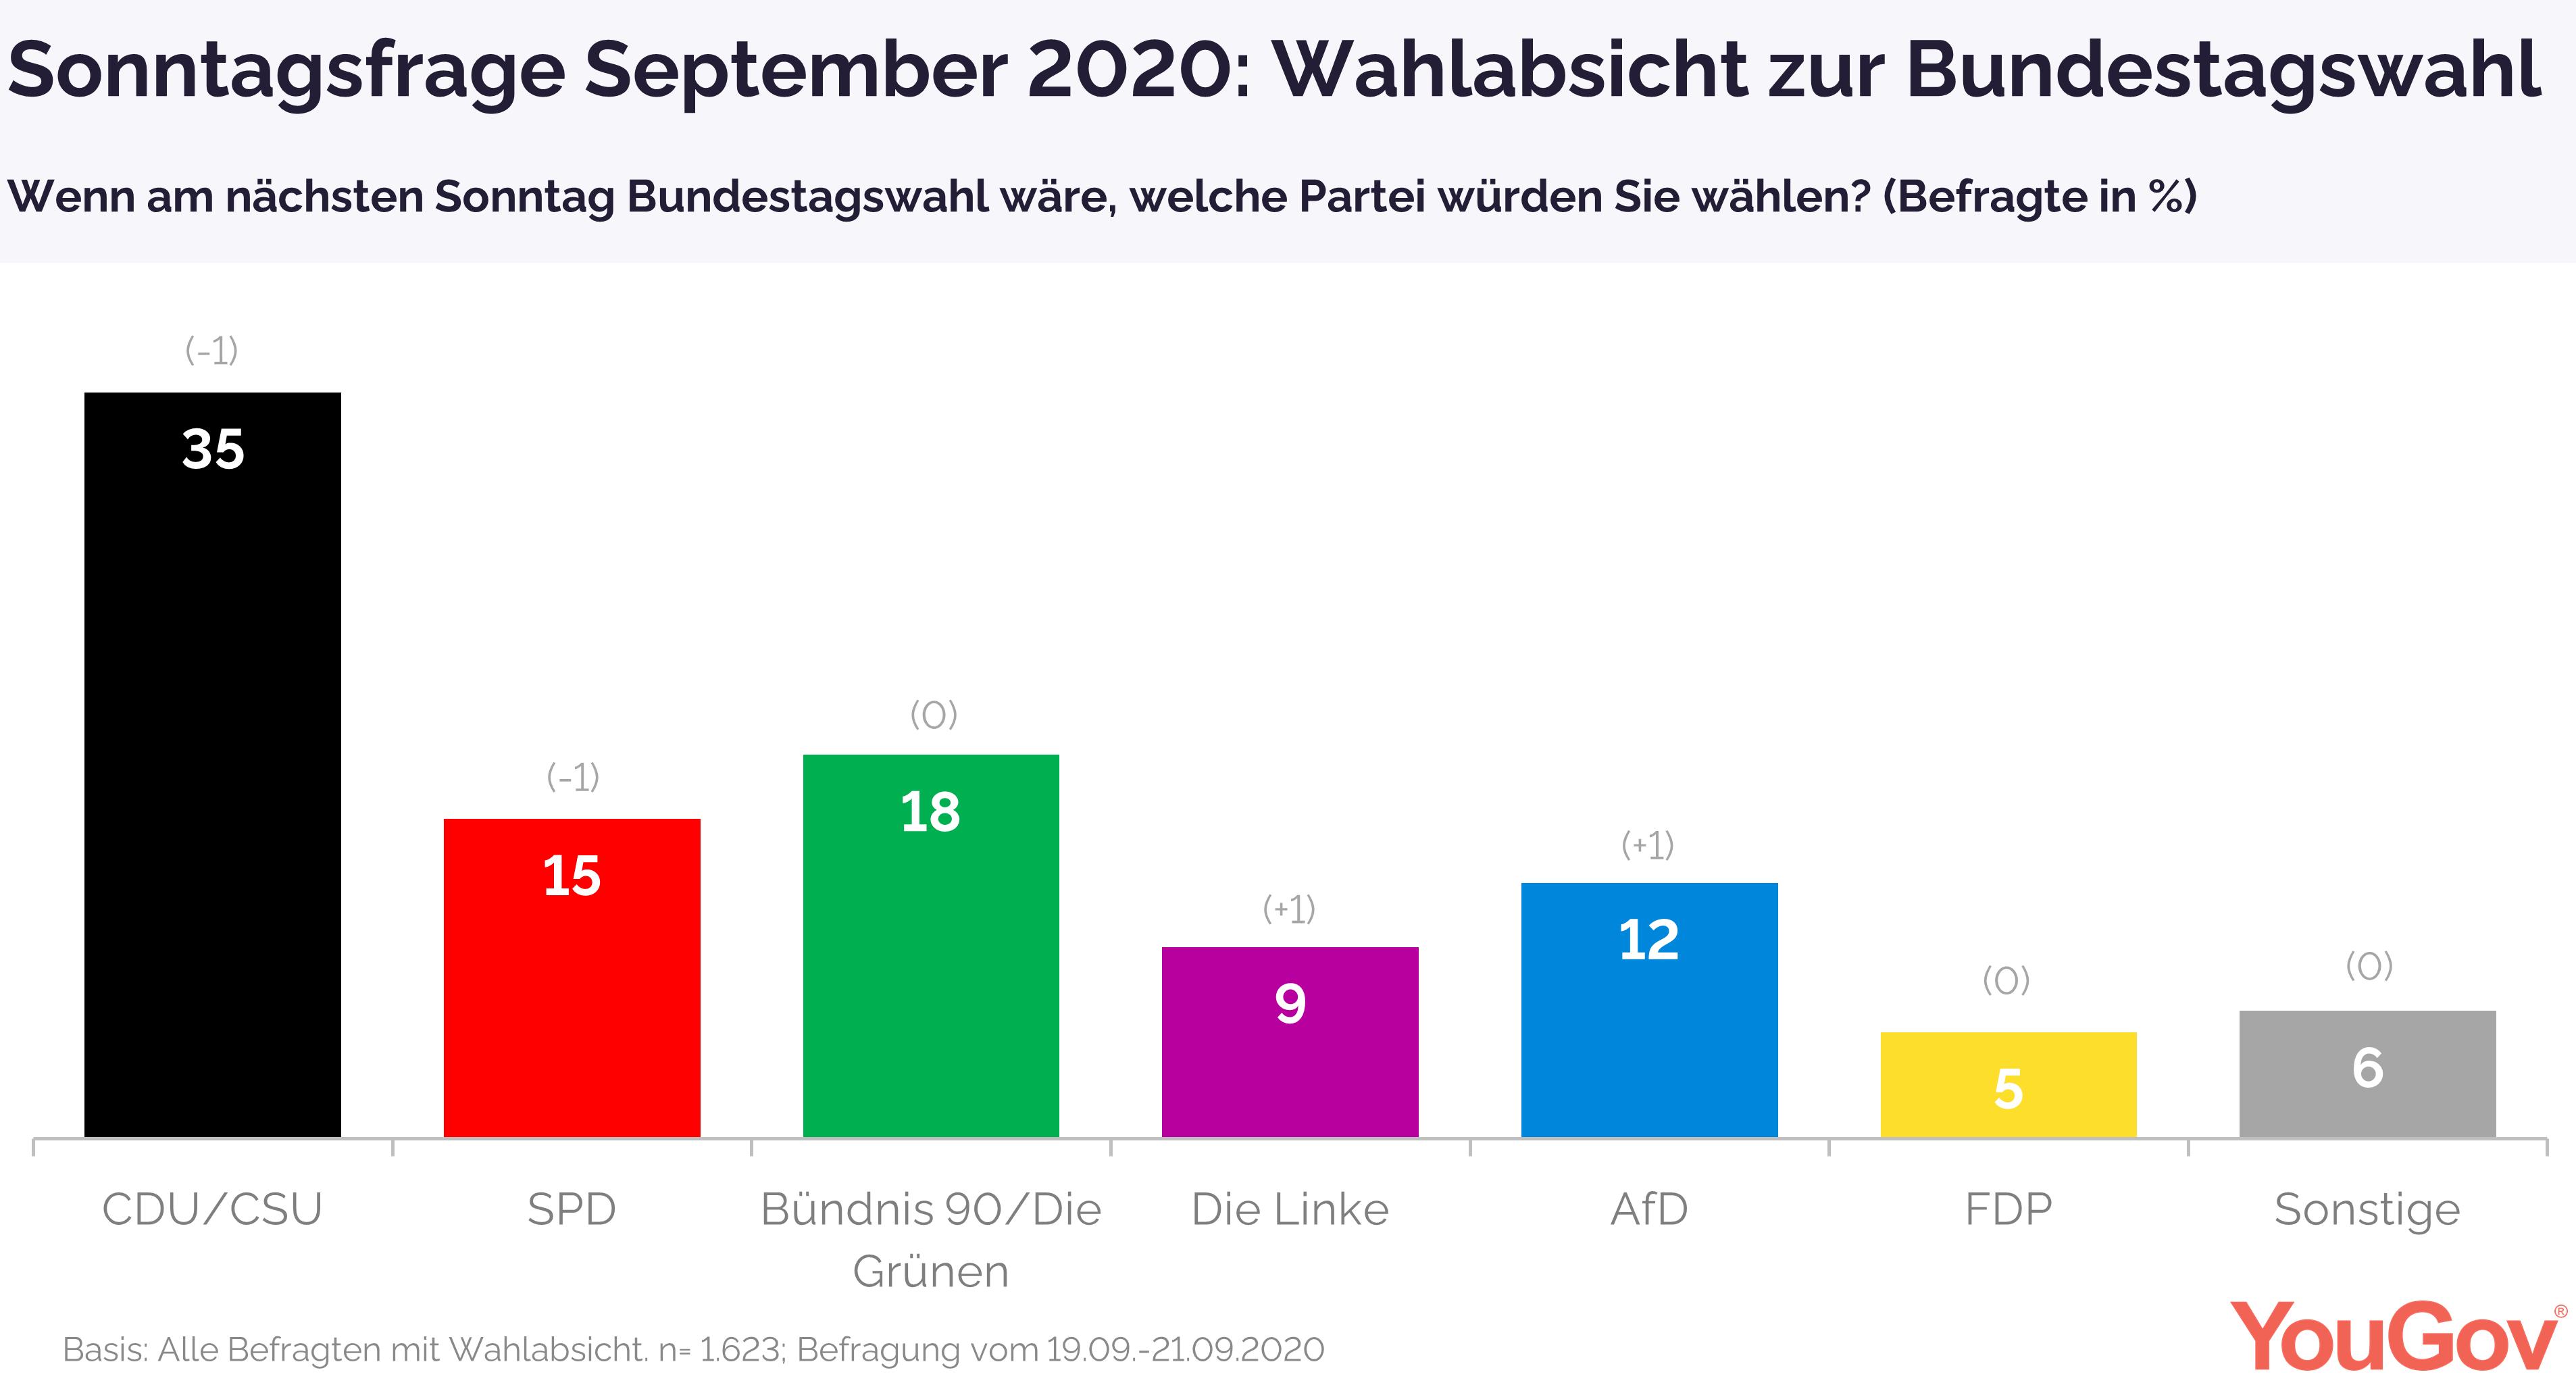 Wahlabsicht Sonntagsfrage September 2020